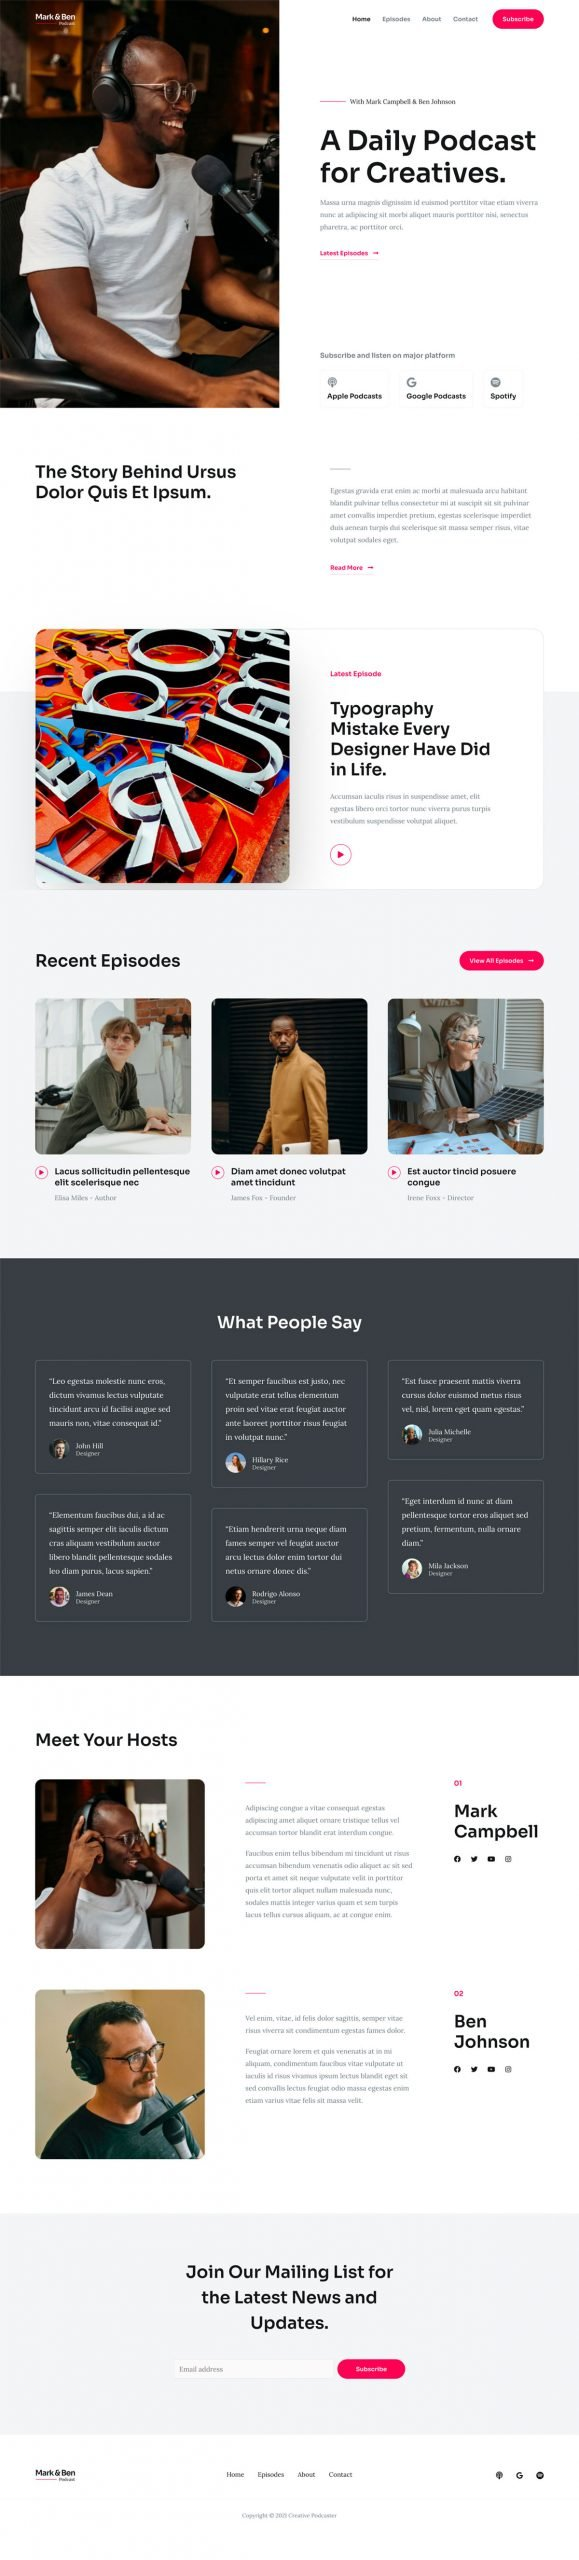 Adamo Web Design | Web Design Durham | creative podcaster 02 home scaled